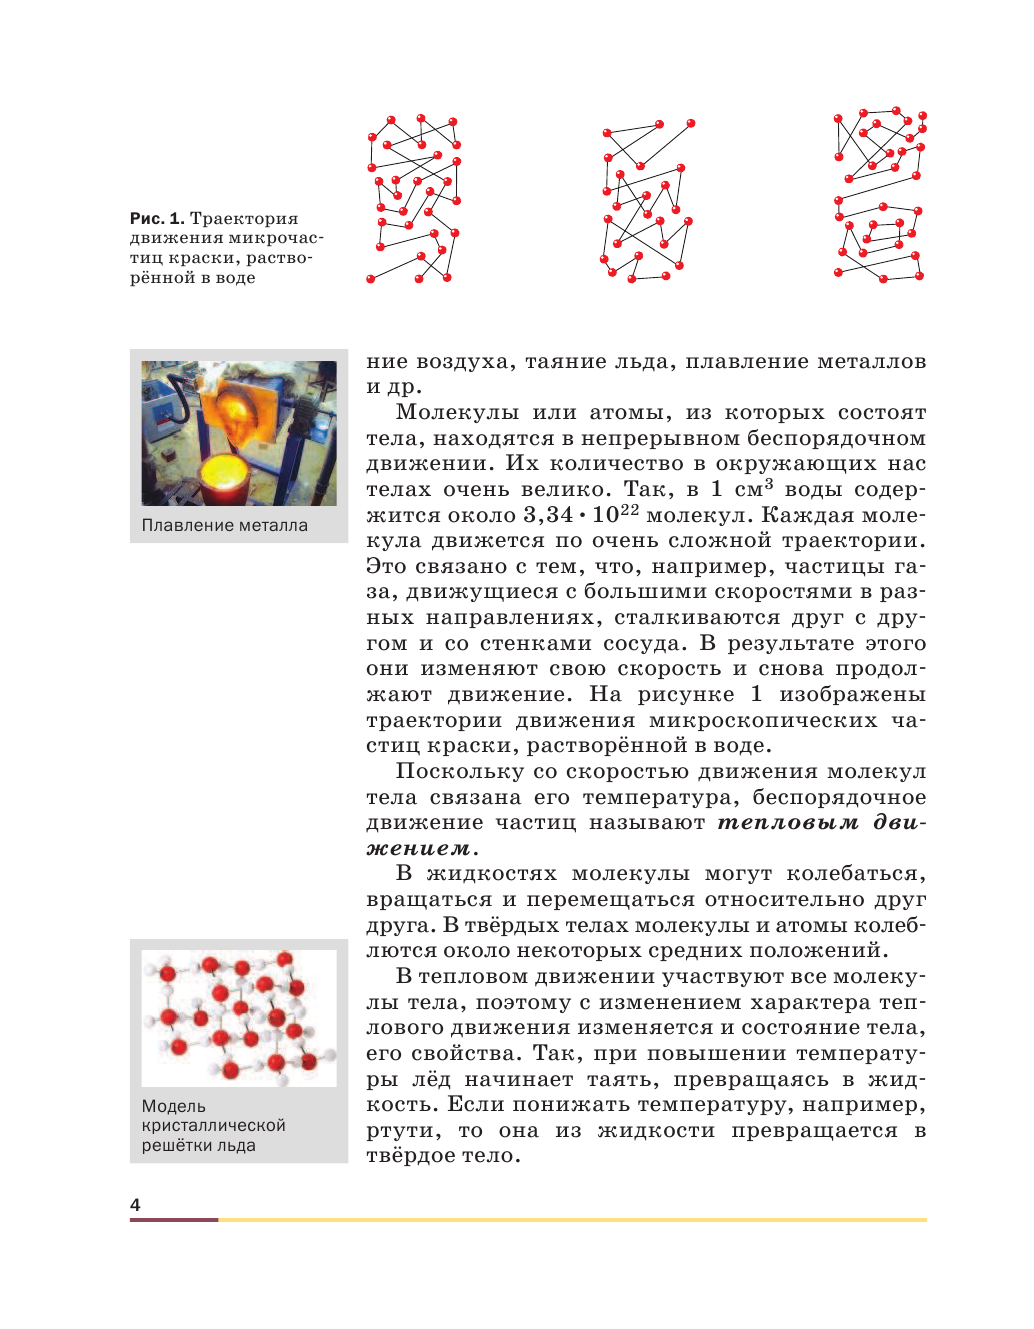 54. Конденсатор Учебник Физики